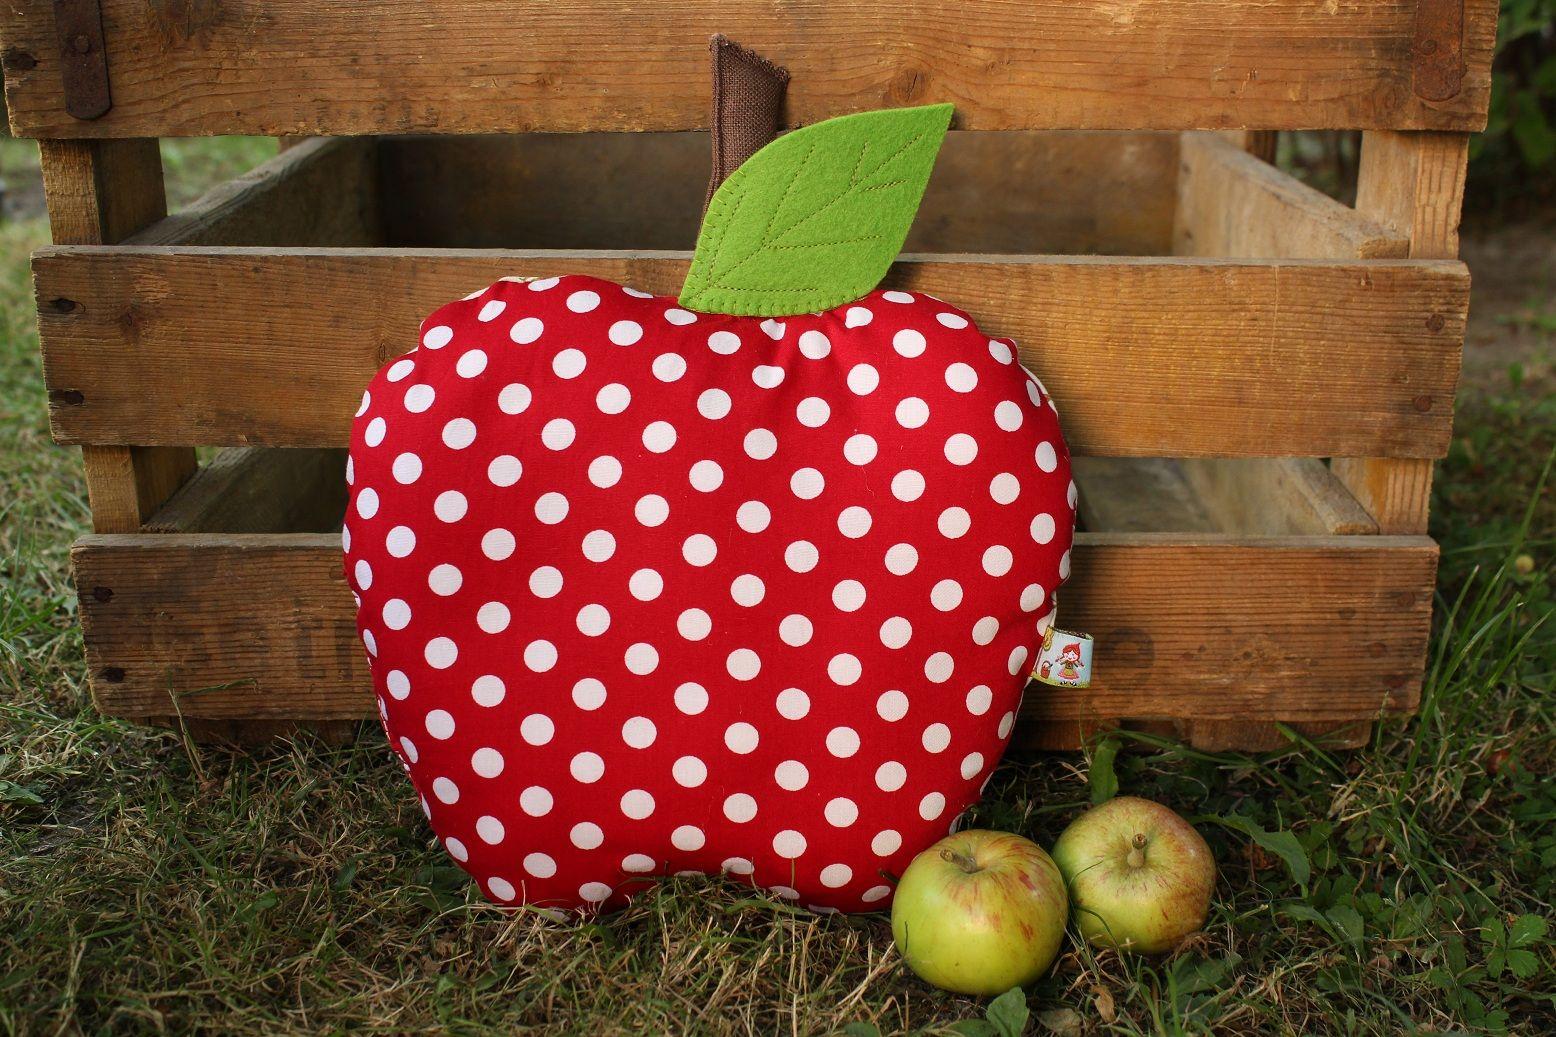 Coussin Pomme/ Apfel Kissen